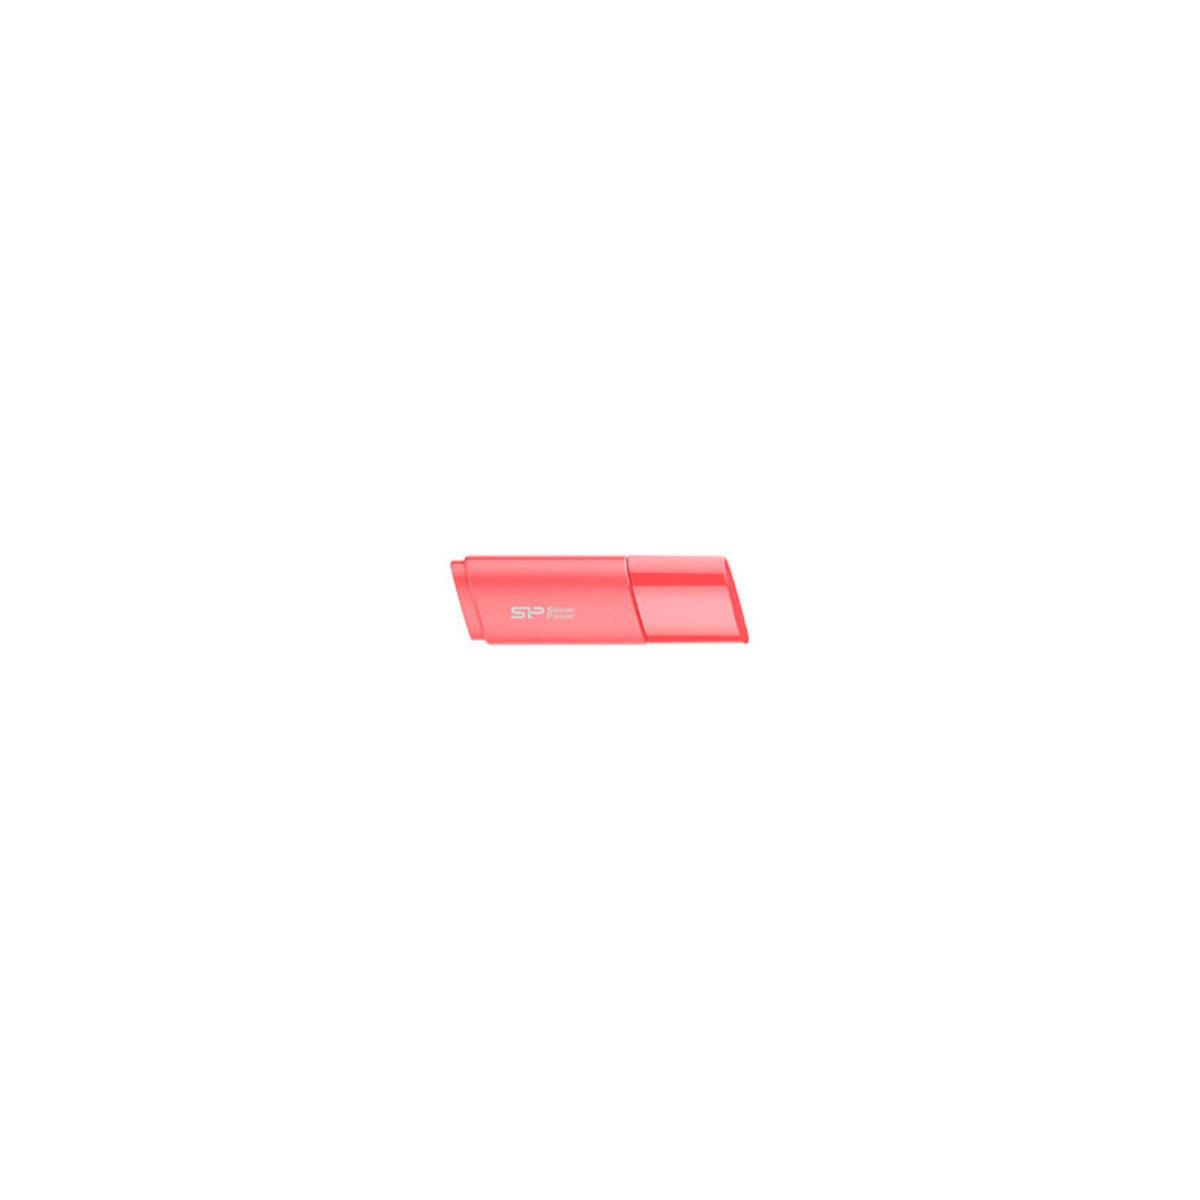 USB2.0快閃記憶棒 Ultima U06 32GB 桃粉紅